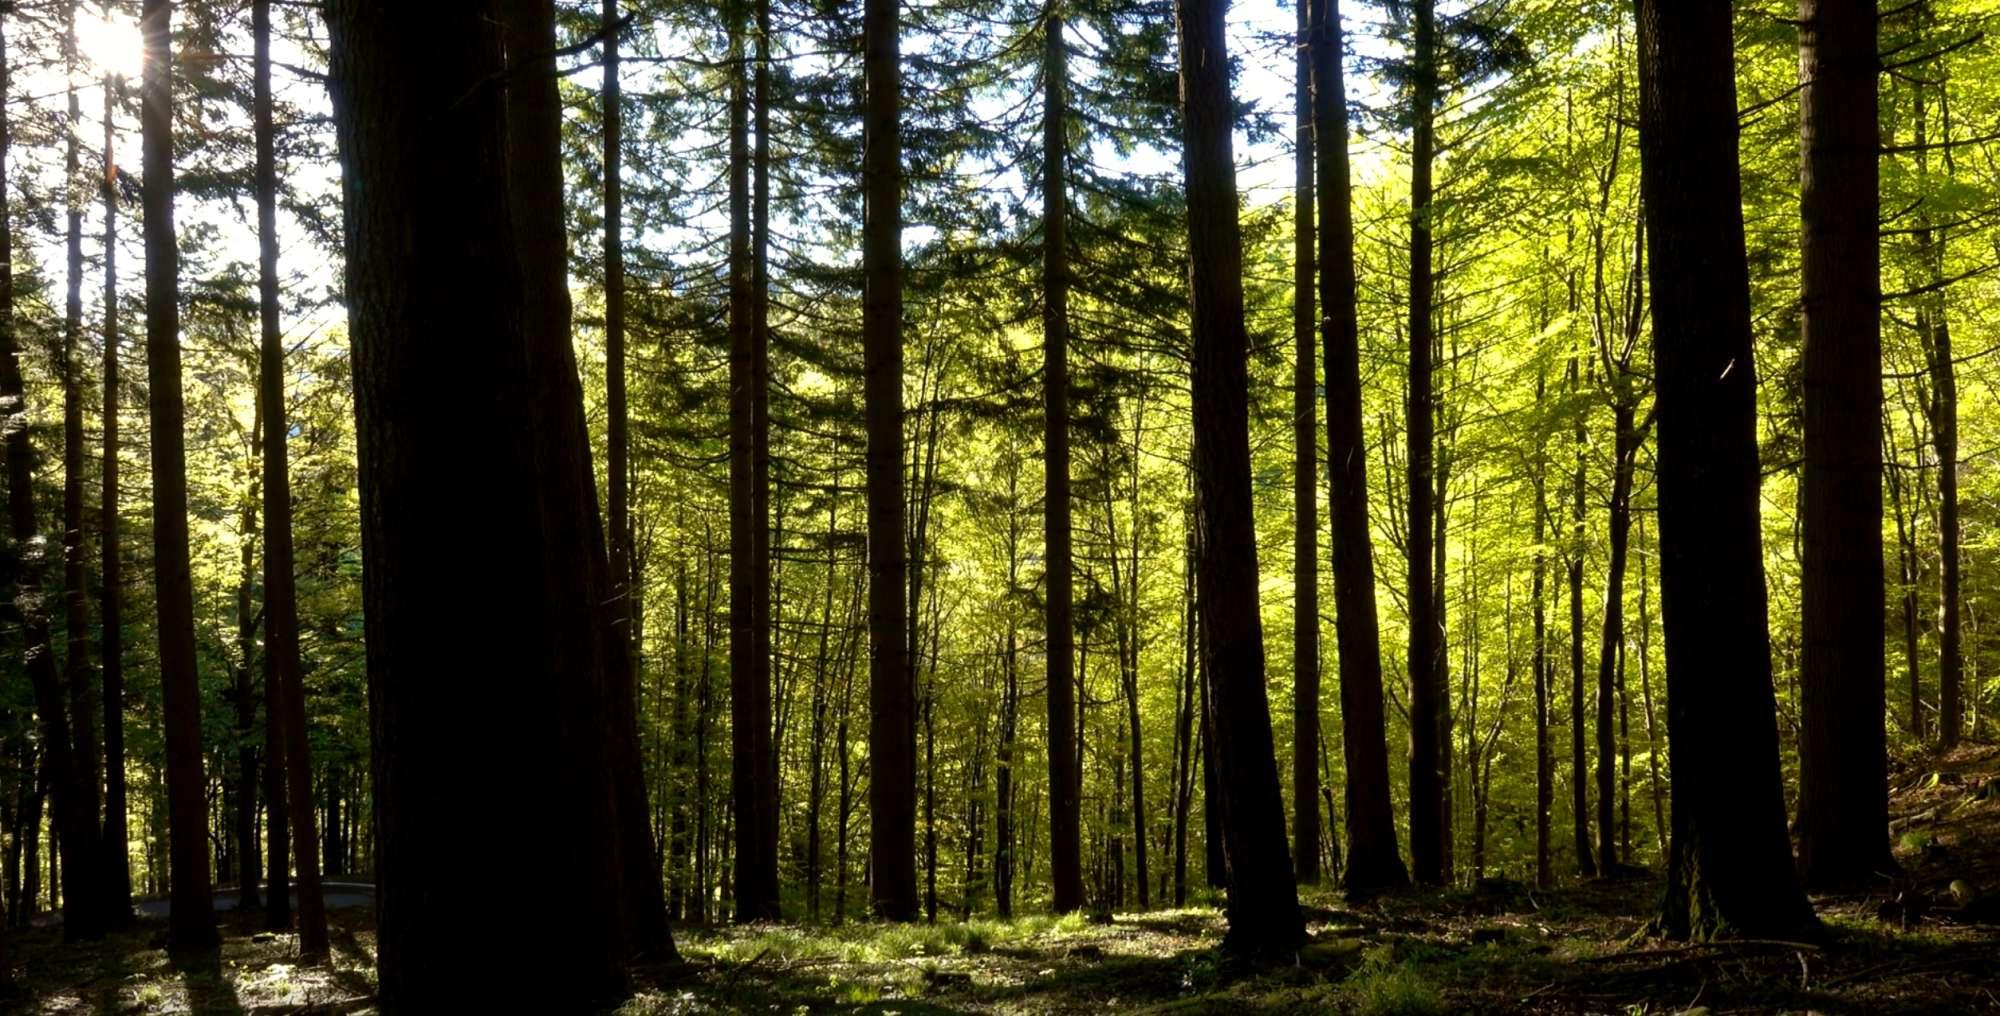 forest_bkg_2